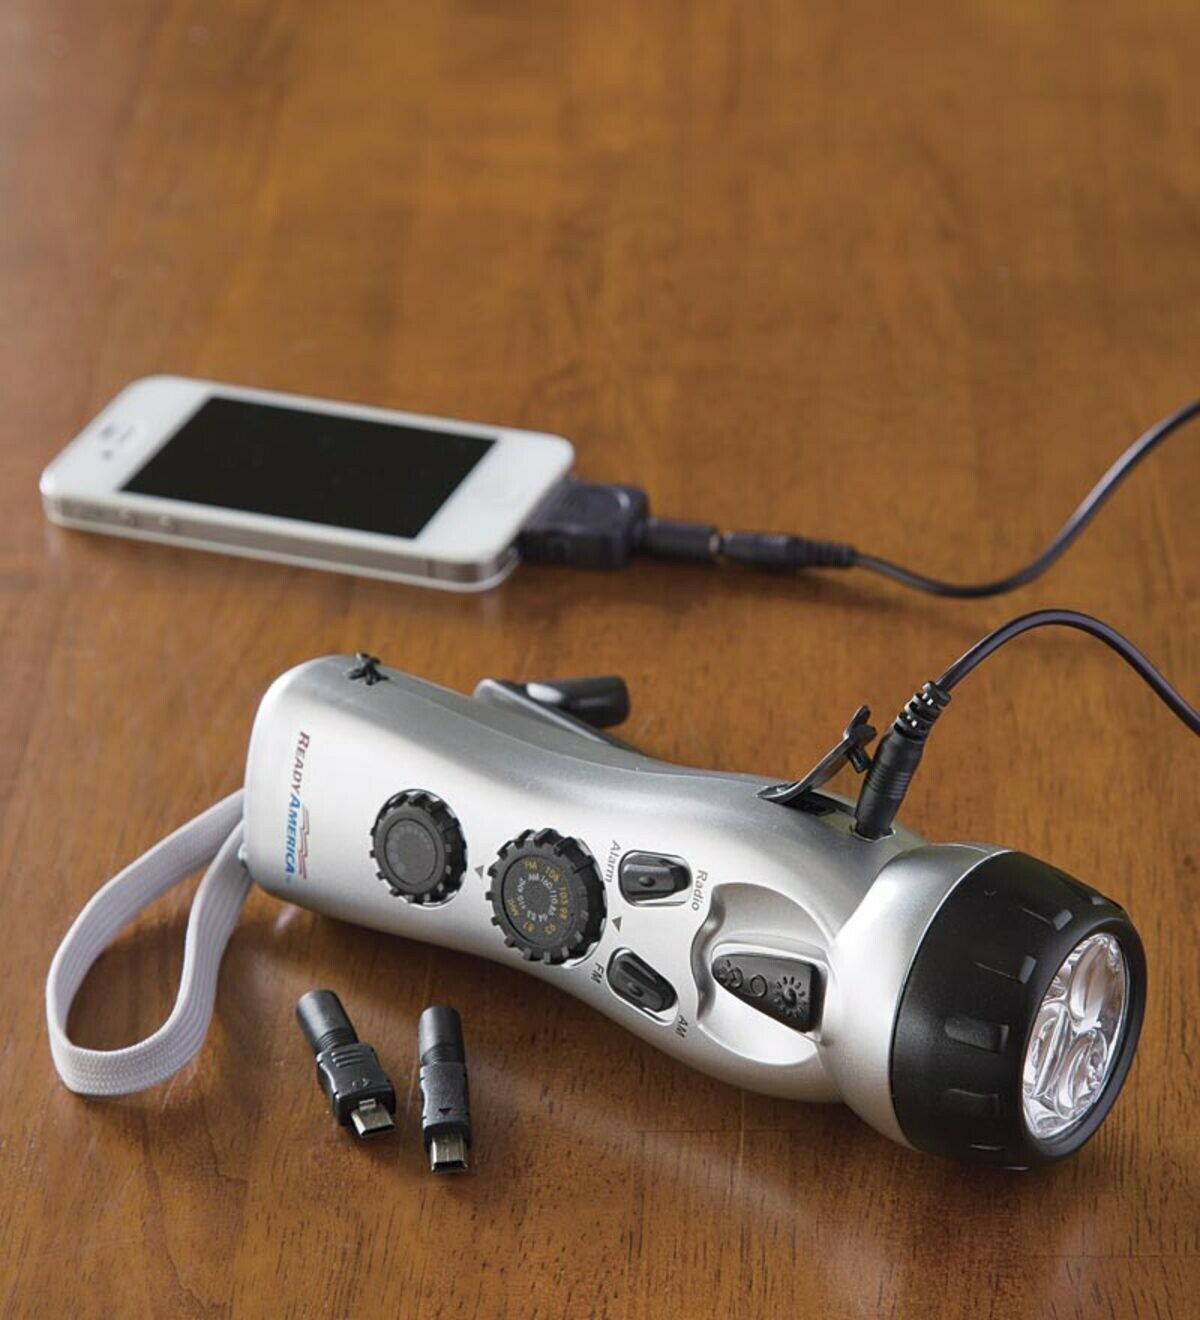 Emergency Power Charging Station Hand Crank USB Port Flashlight AM FM Radio